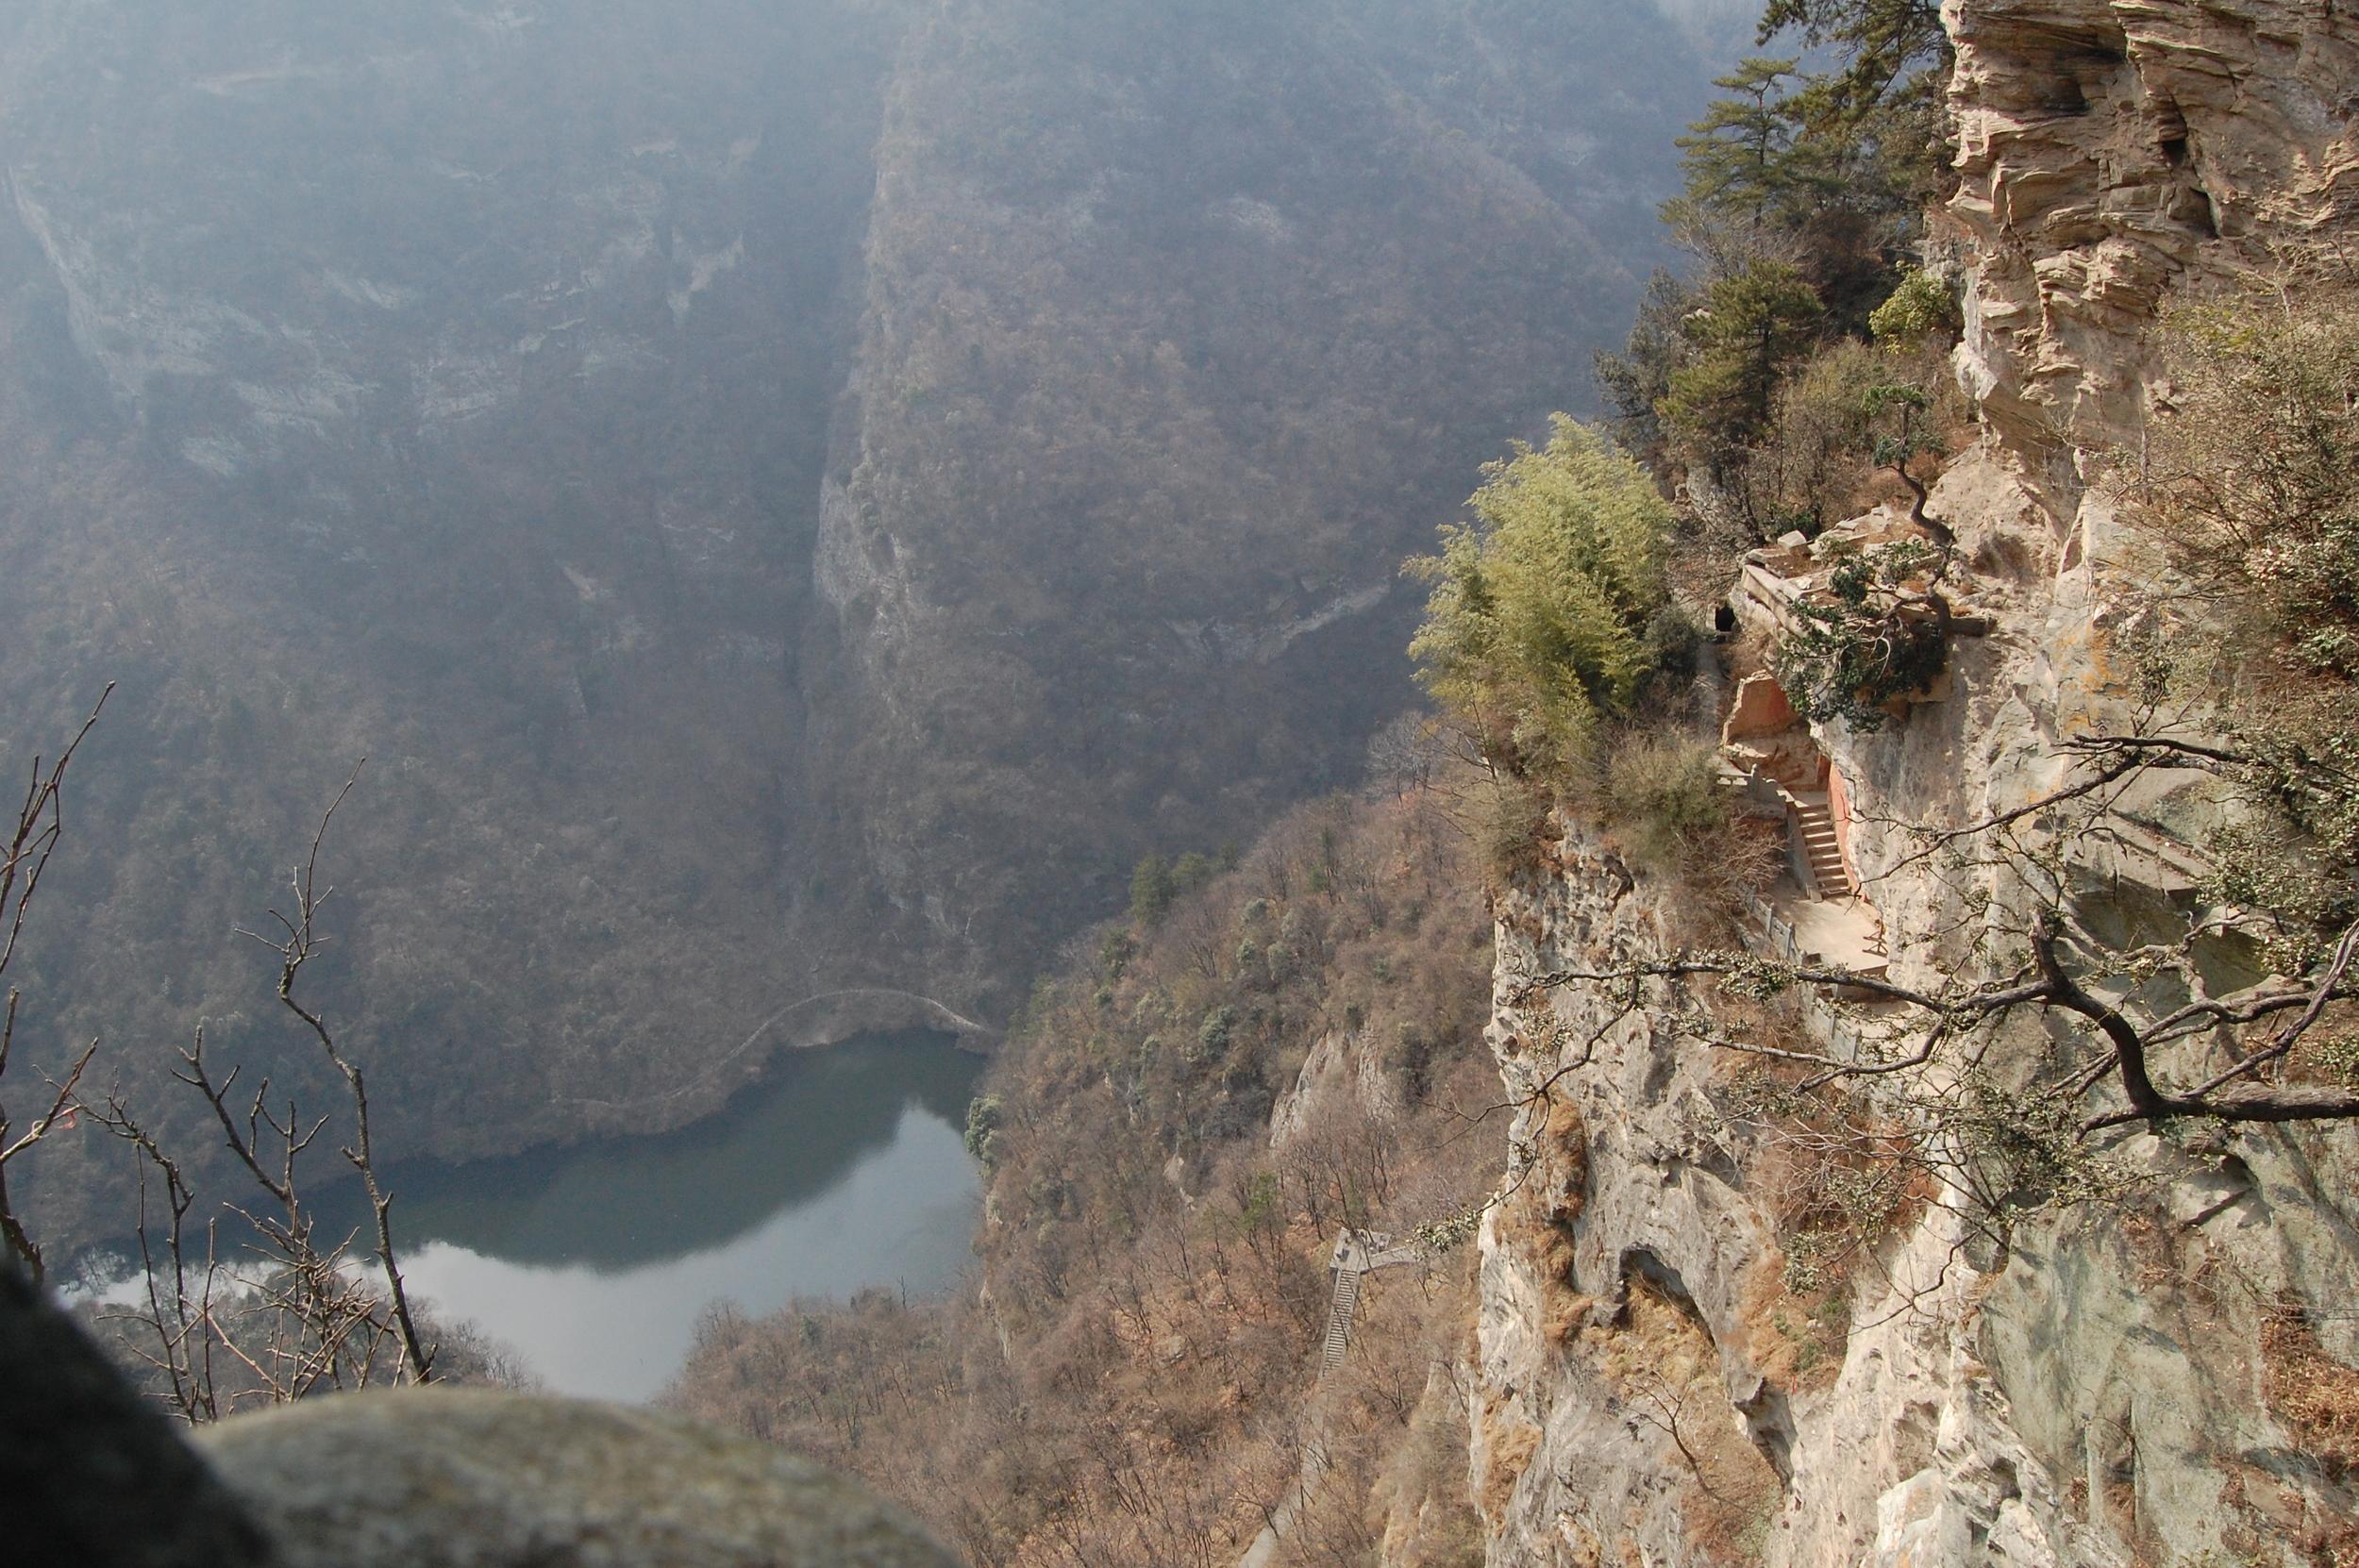 Cliff stairs at Wudang Mountain, China